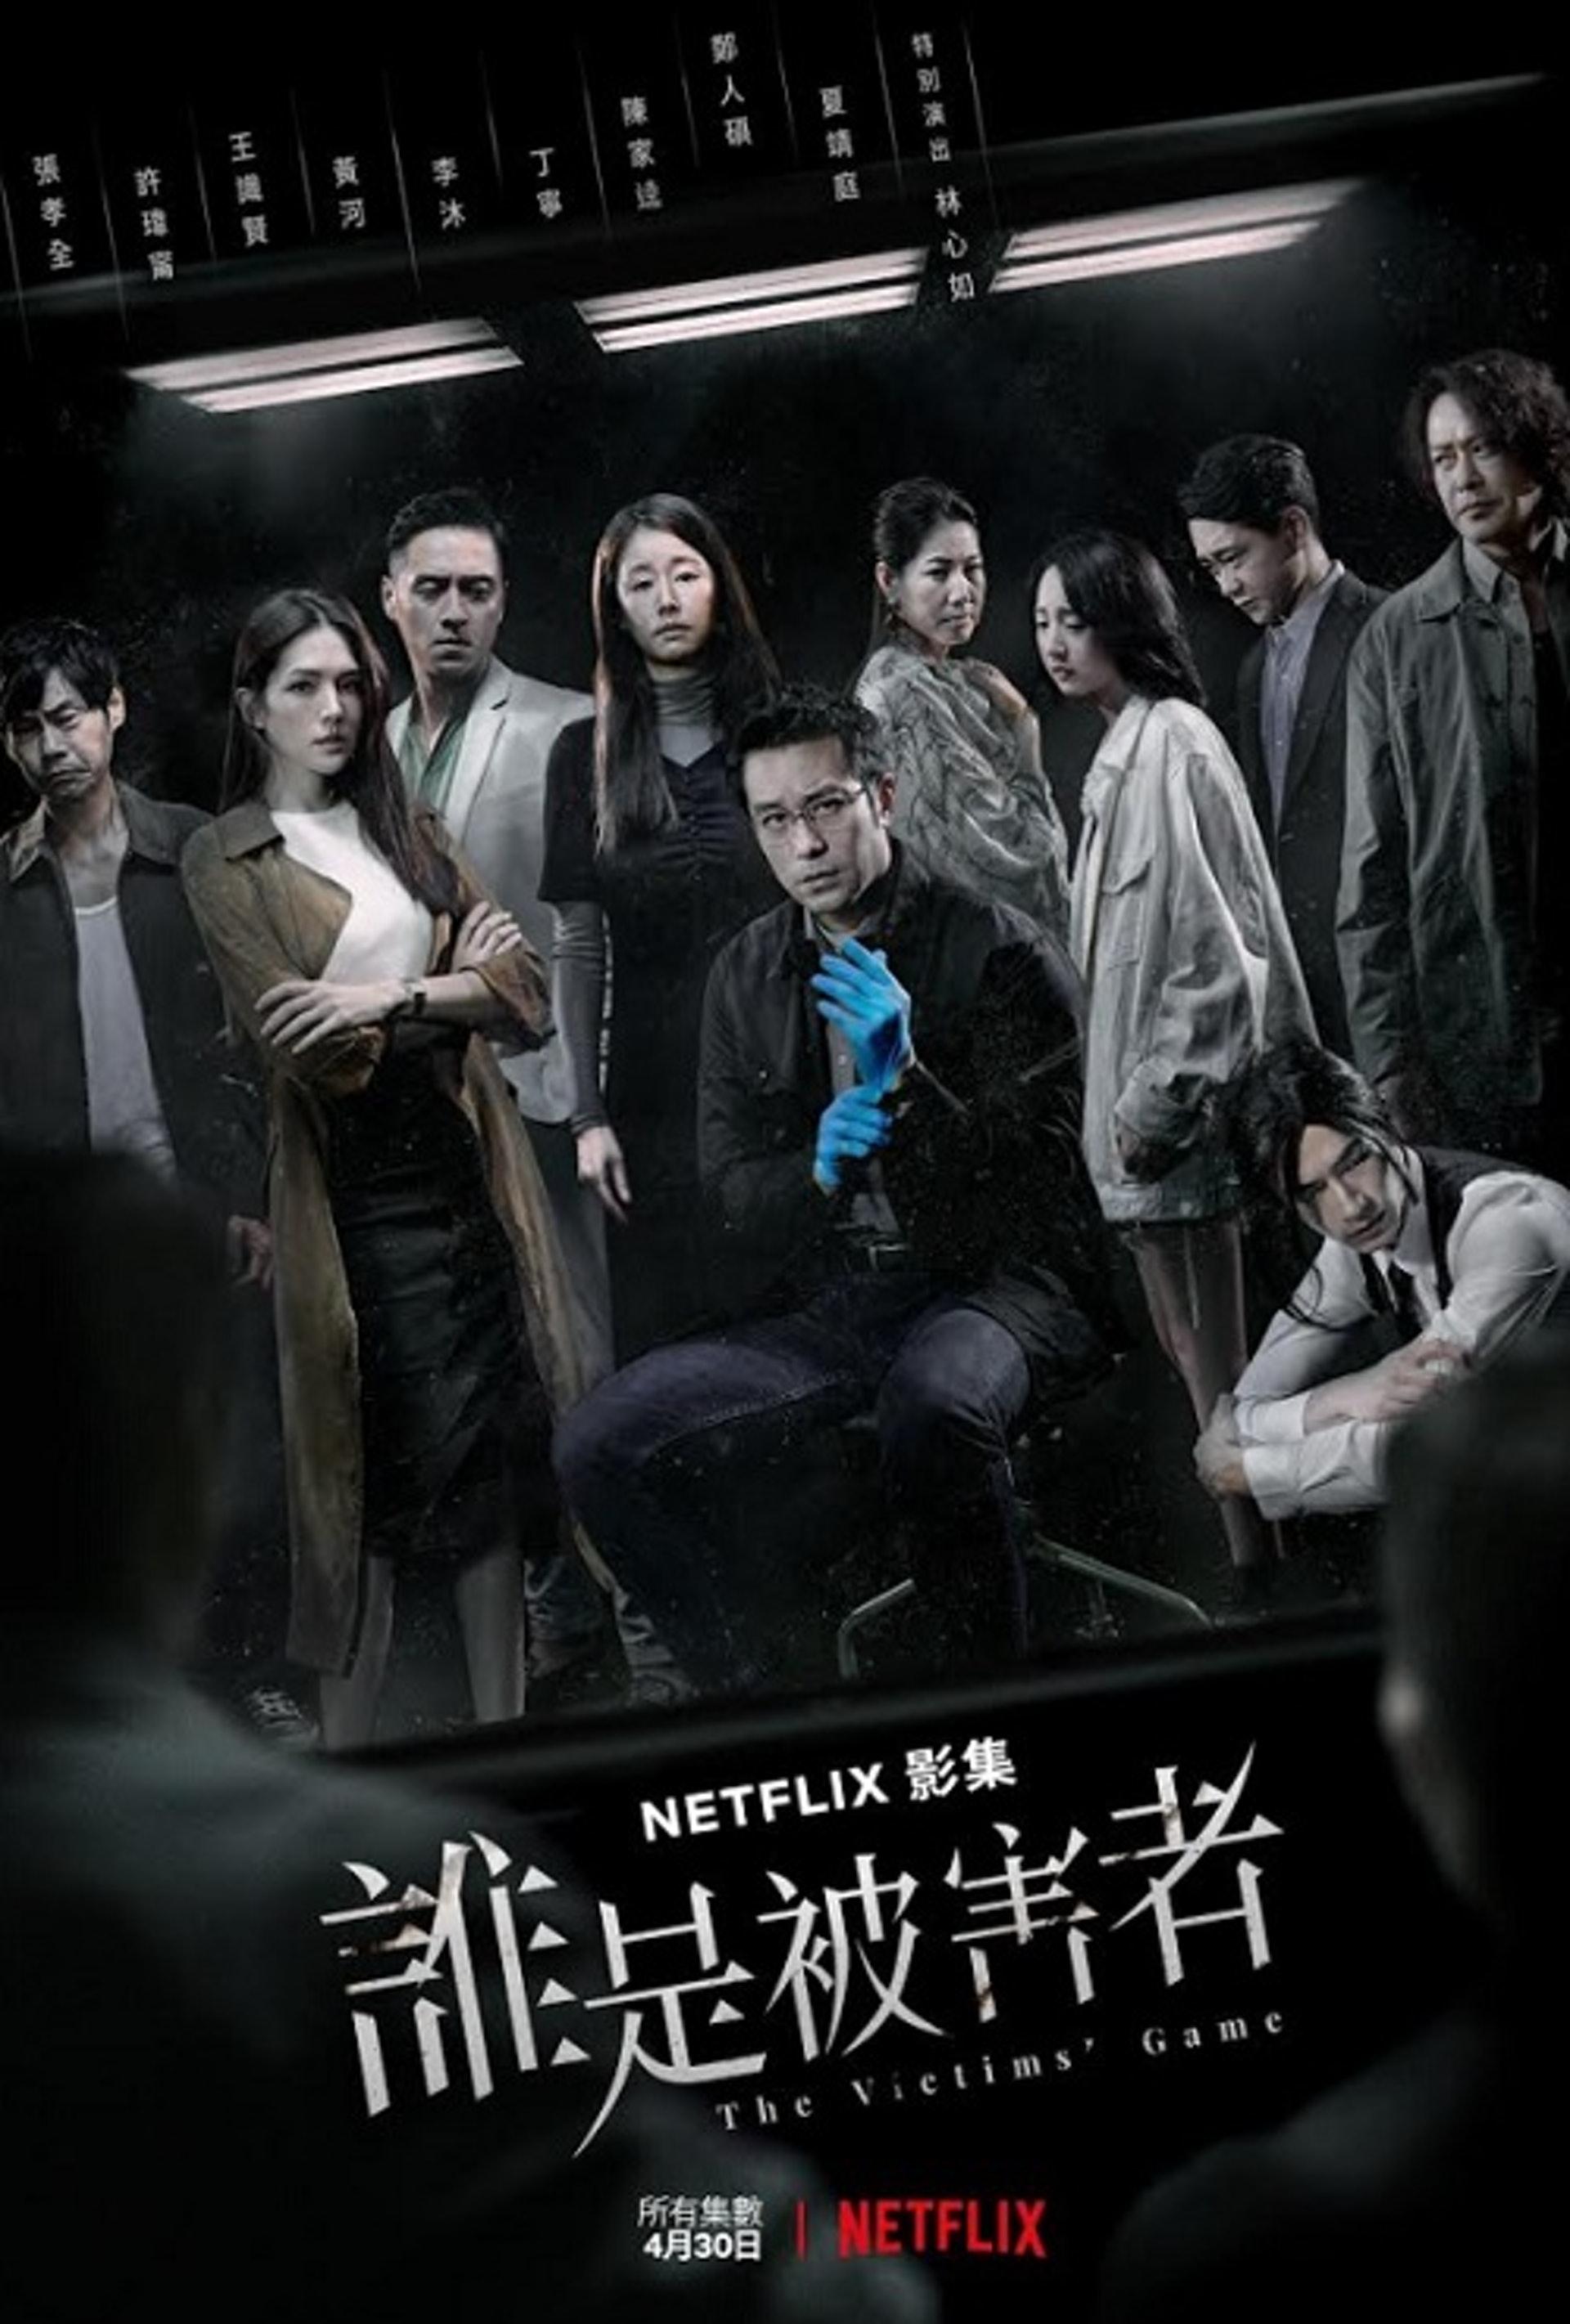 Netflix 2020年播出的《谁是被害者》